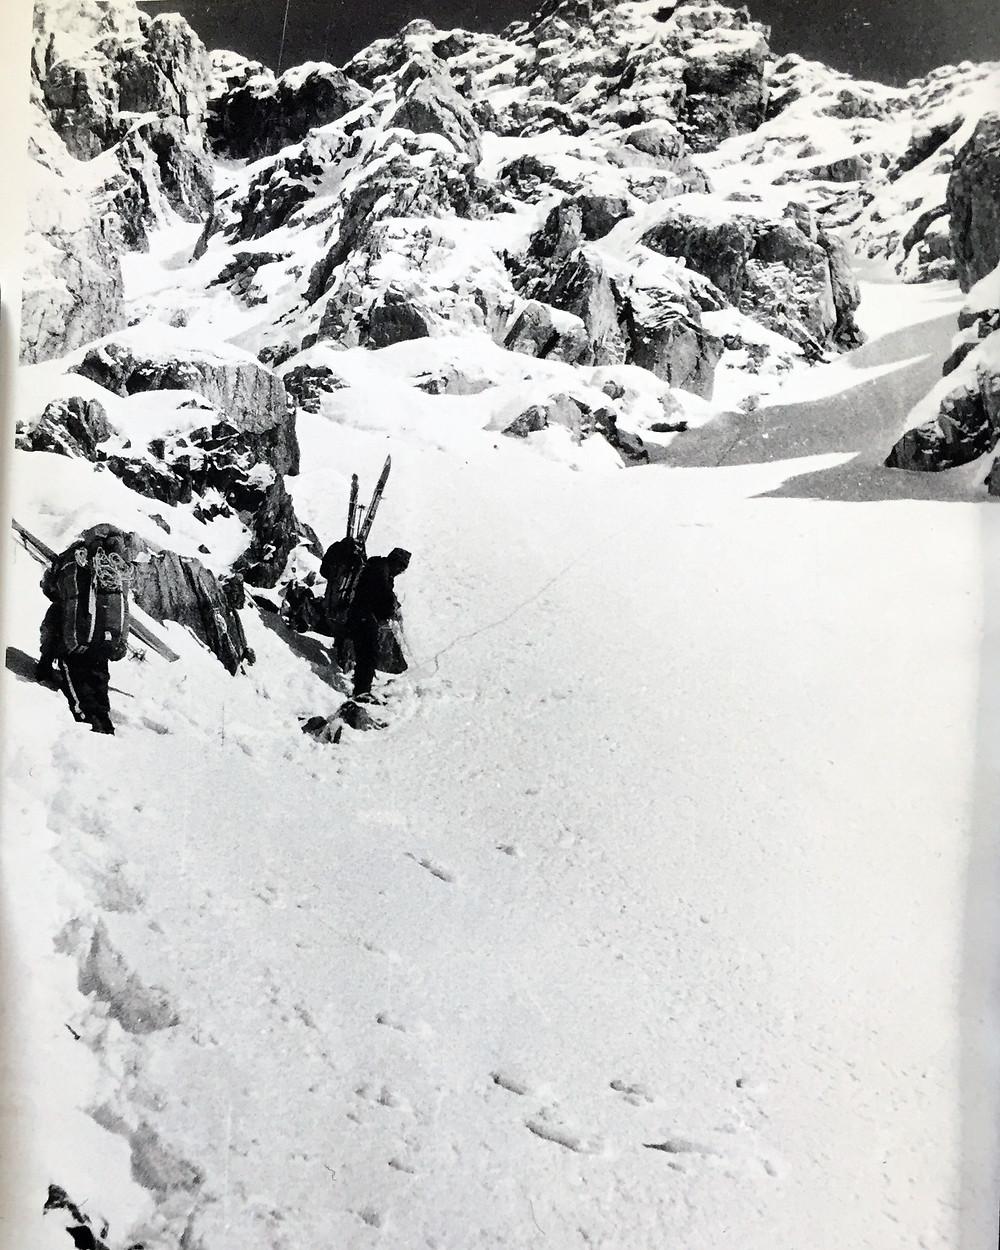 Спуск с перевала Хабаровский| skitour.club| Блог Сергея Чеботова